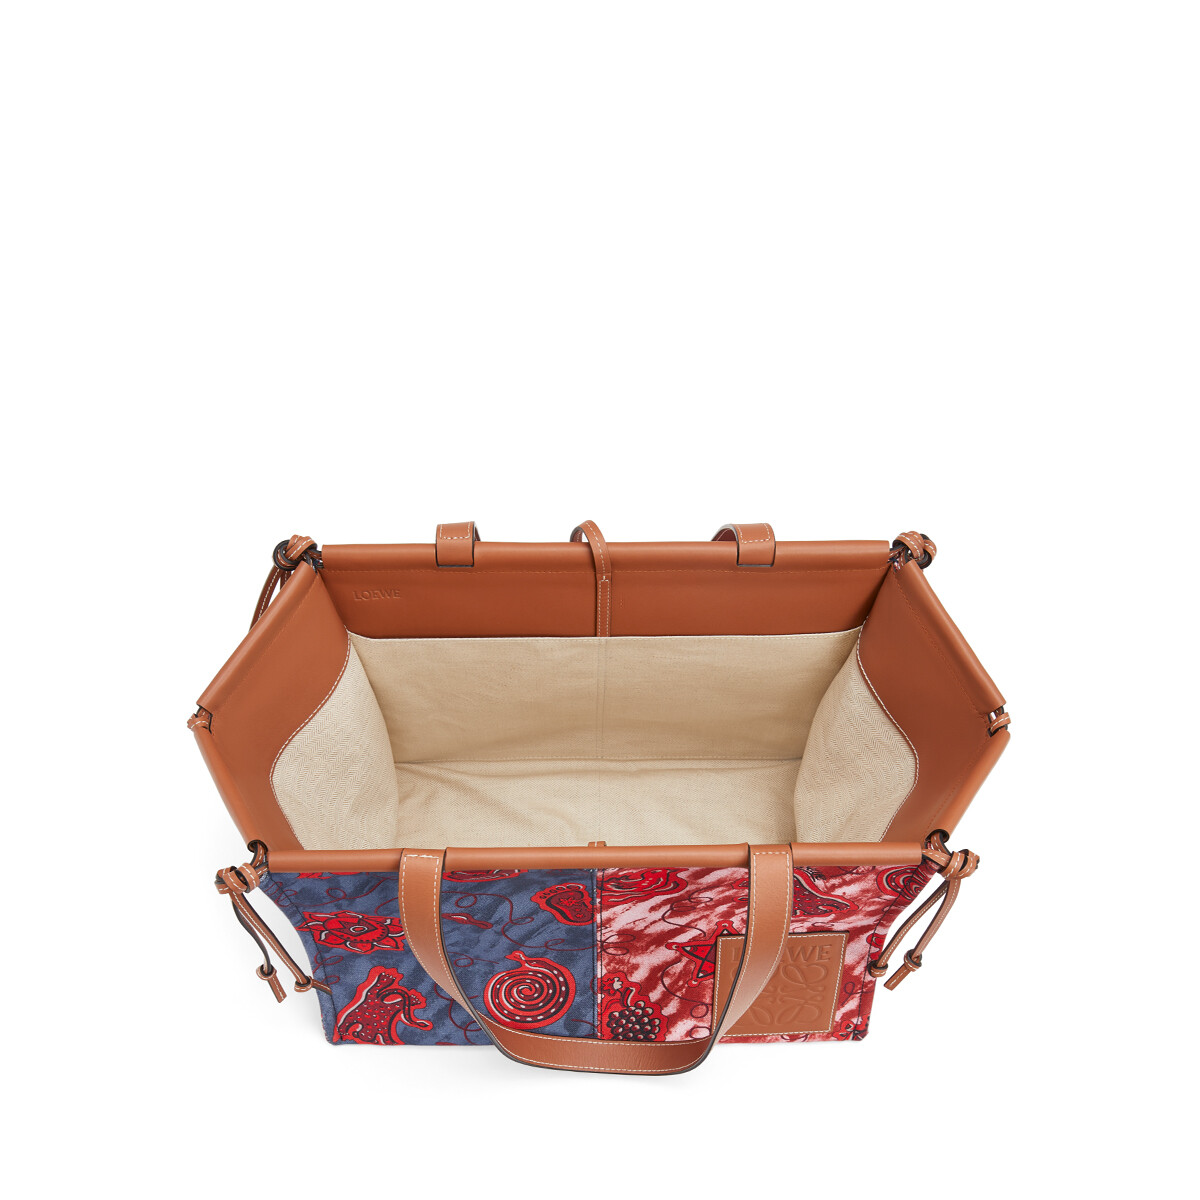 LOEWE Paula's Cushion Tote Prints 蓝色/红色 front